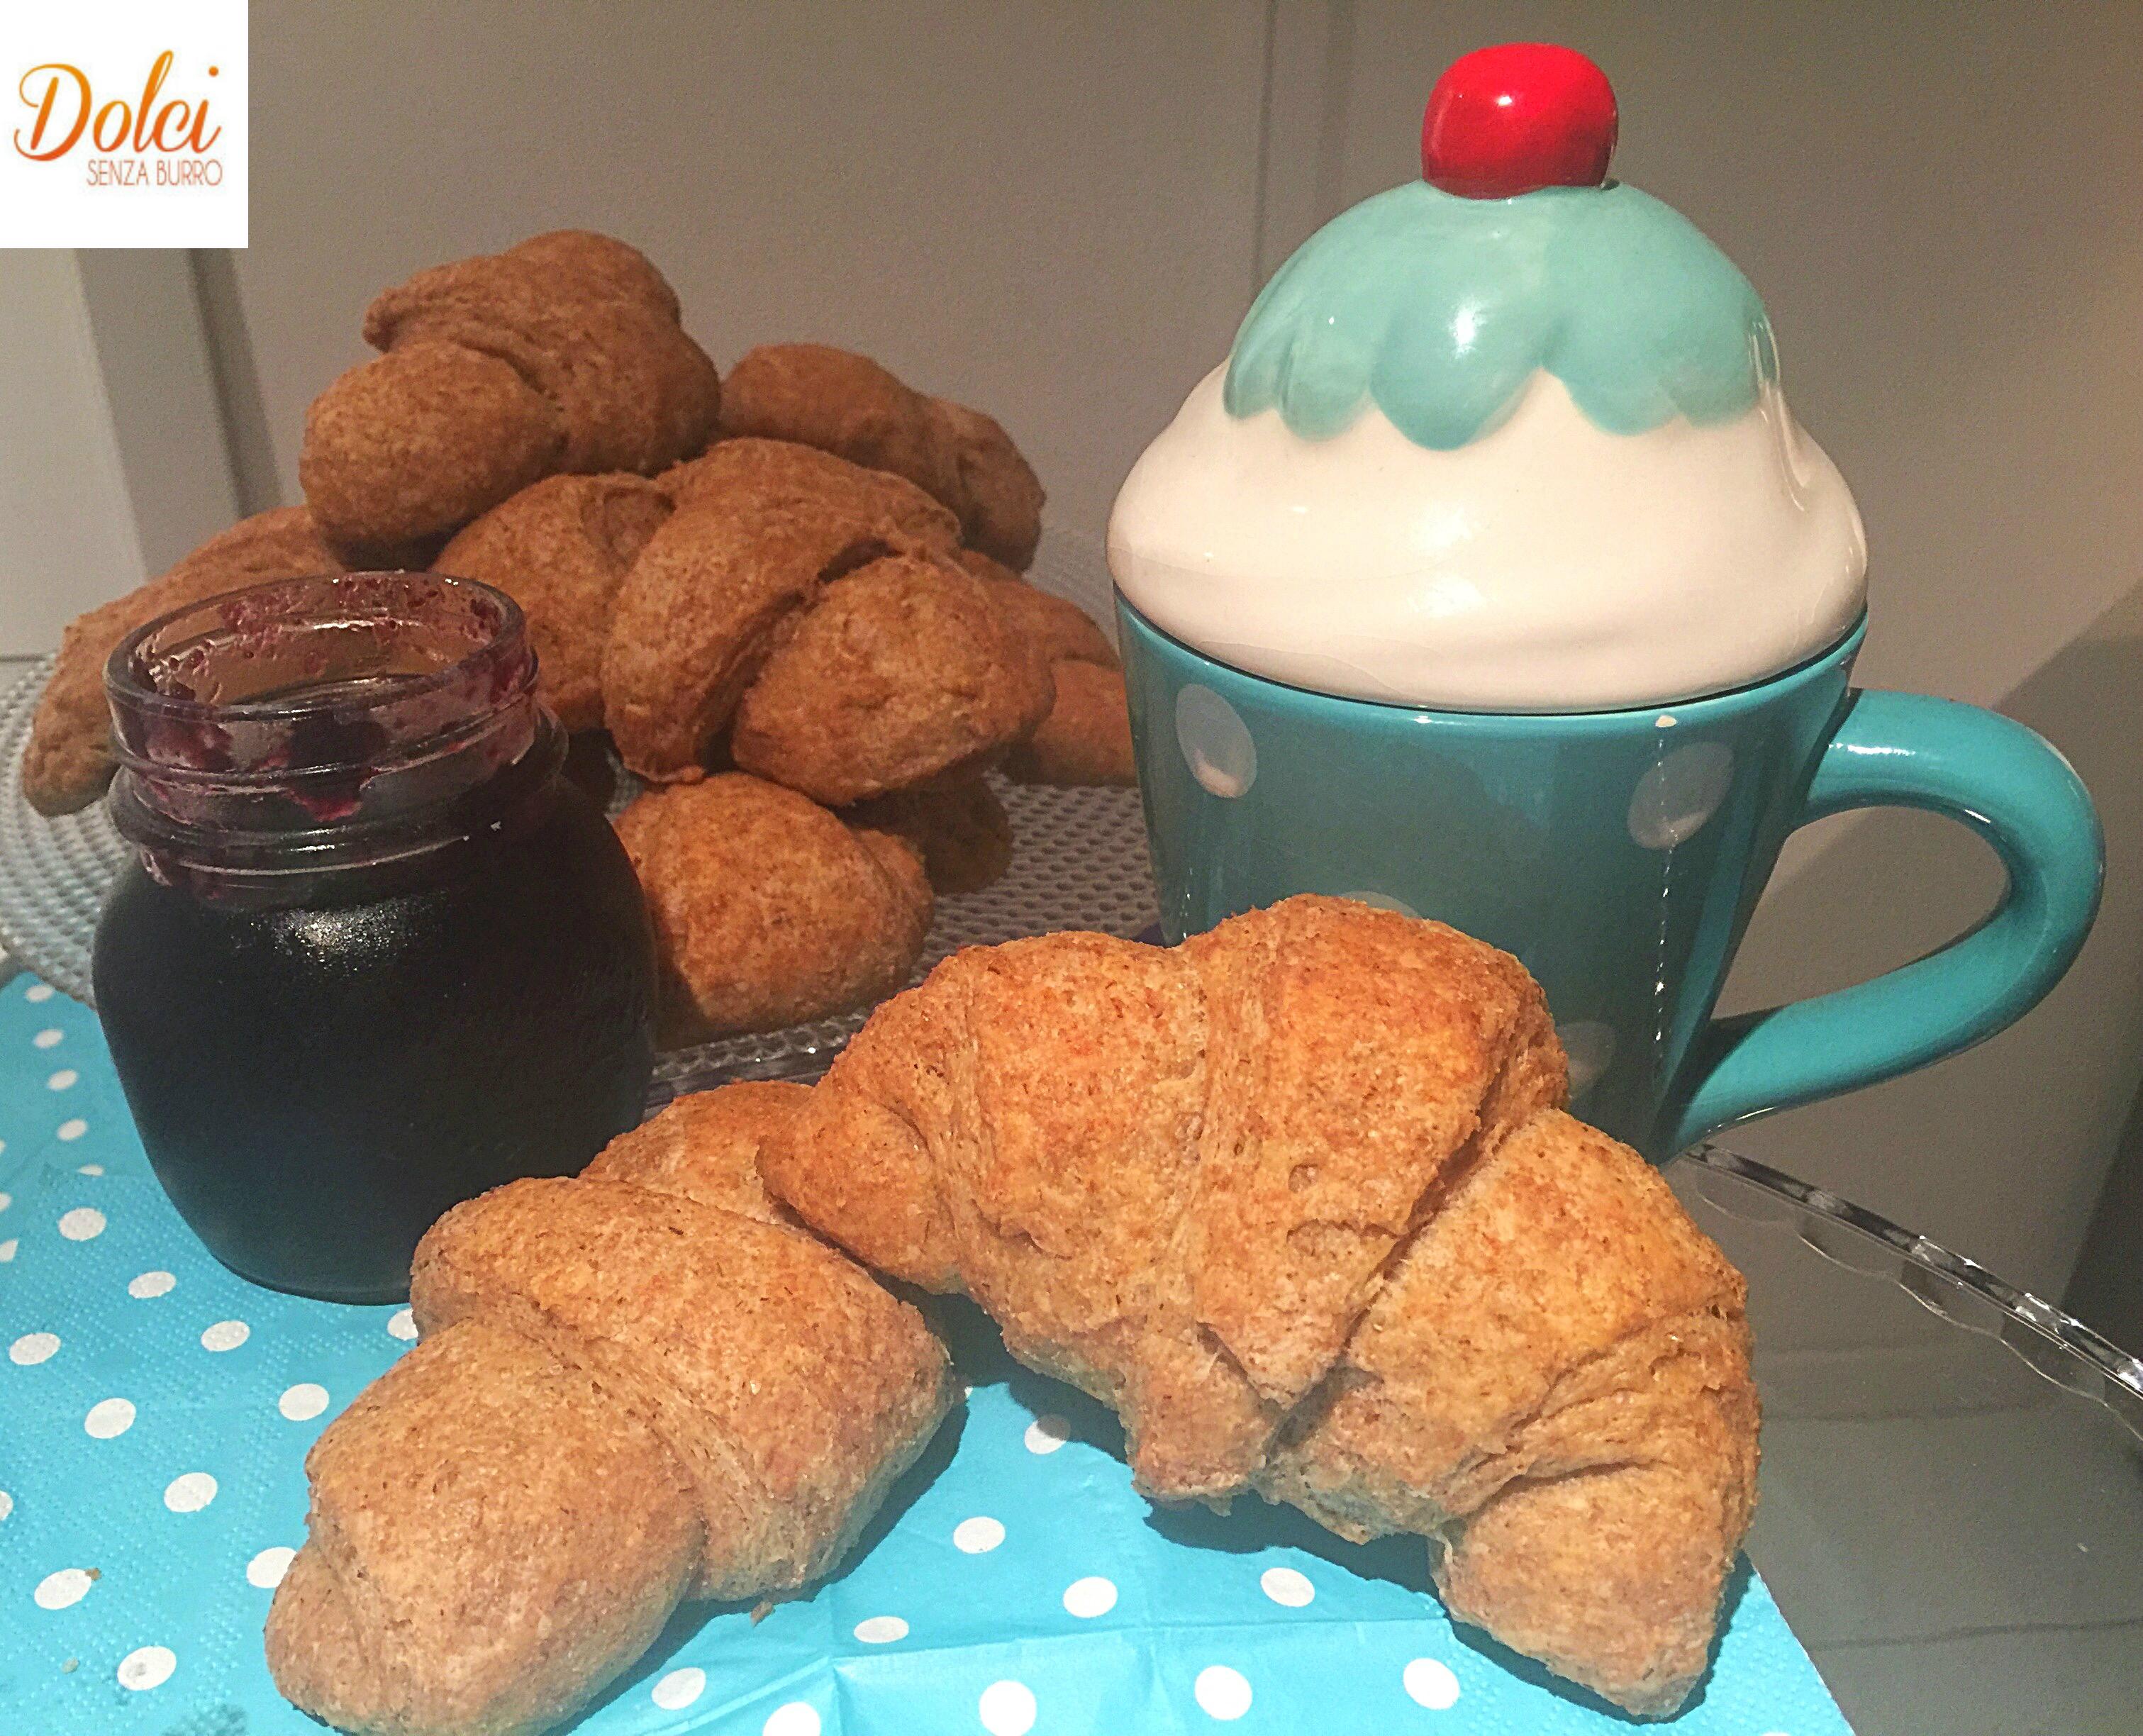 Croissant Integrali Senza Burro e senza zucchero preparati con la stevia da dolci senza burro